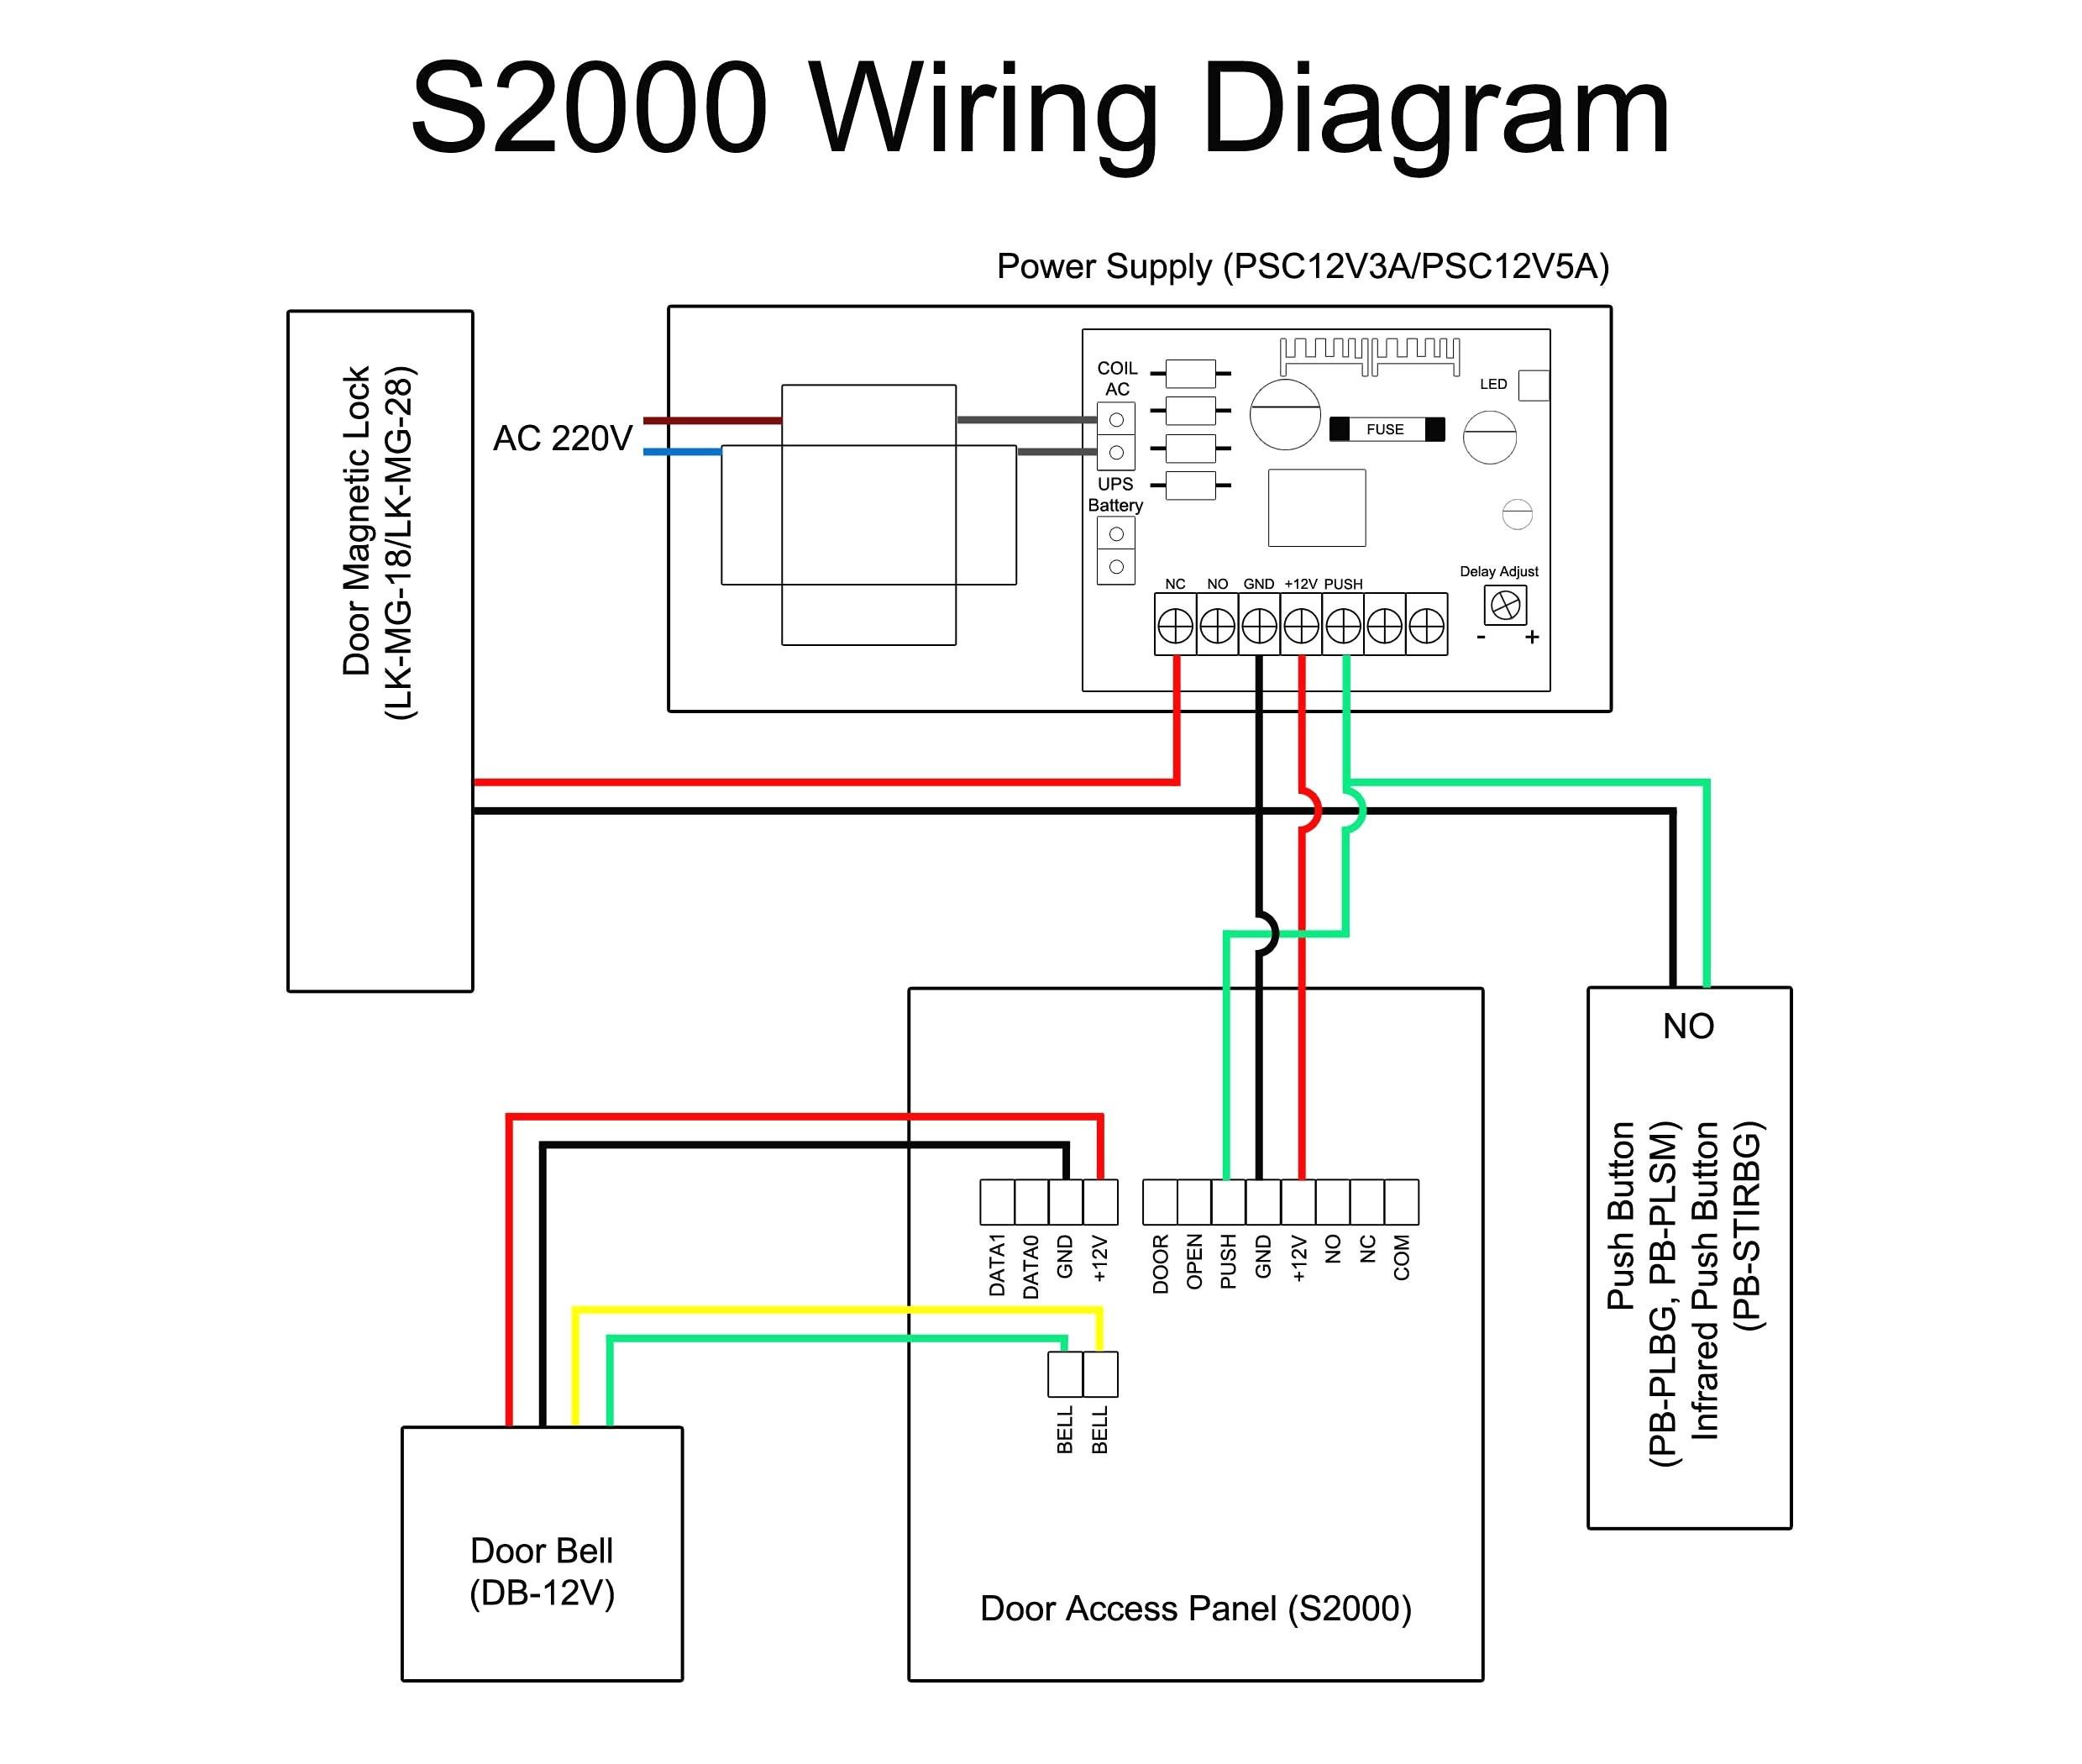 magnetic door switch wiring diagram Collection-Wiring Diagram for Magnetic Door Lock Best Valid Wiring Diagram Intruder Alarm 6-c